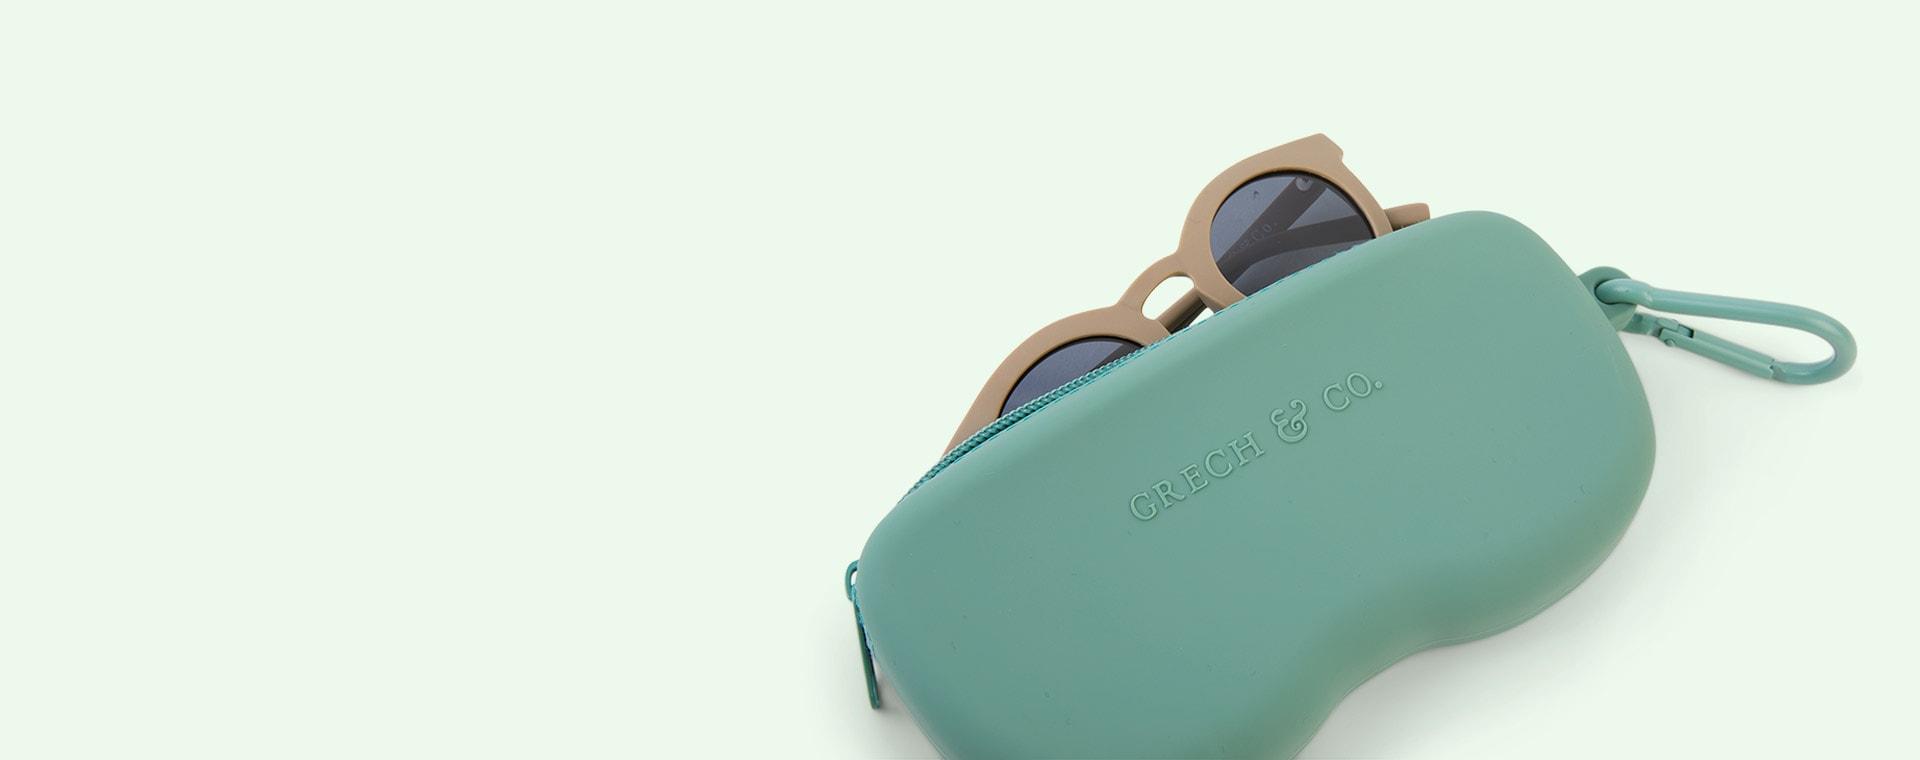 Fern Grech & Co Sunglasses Case